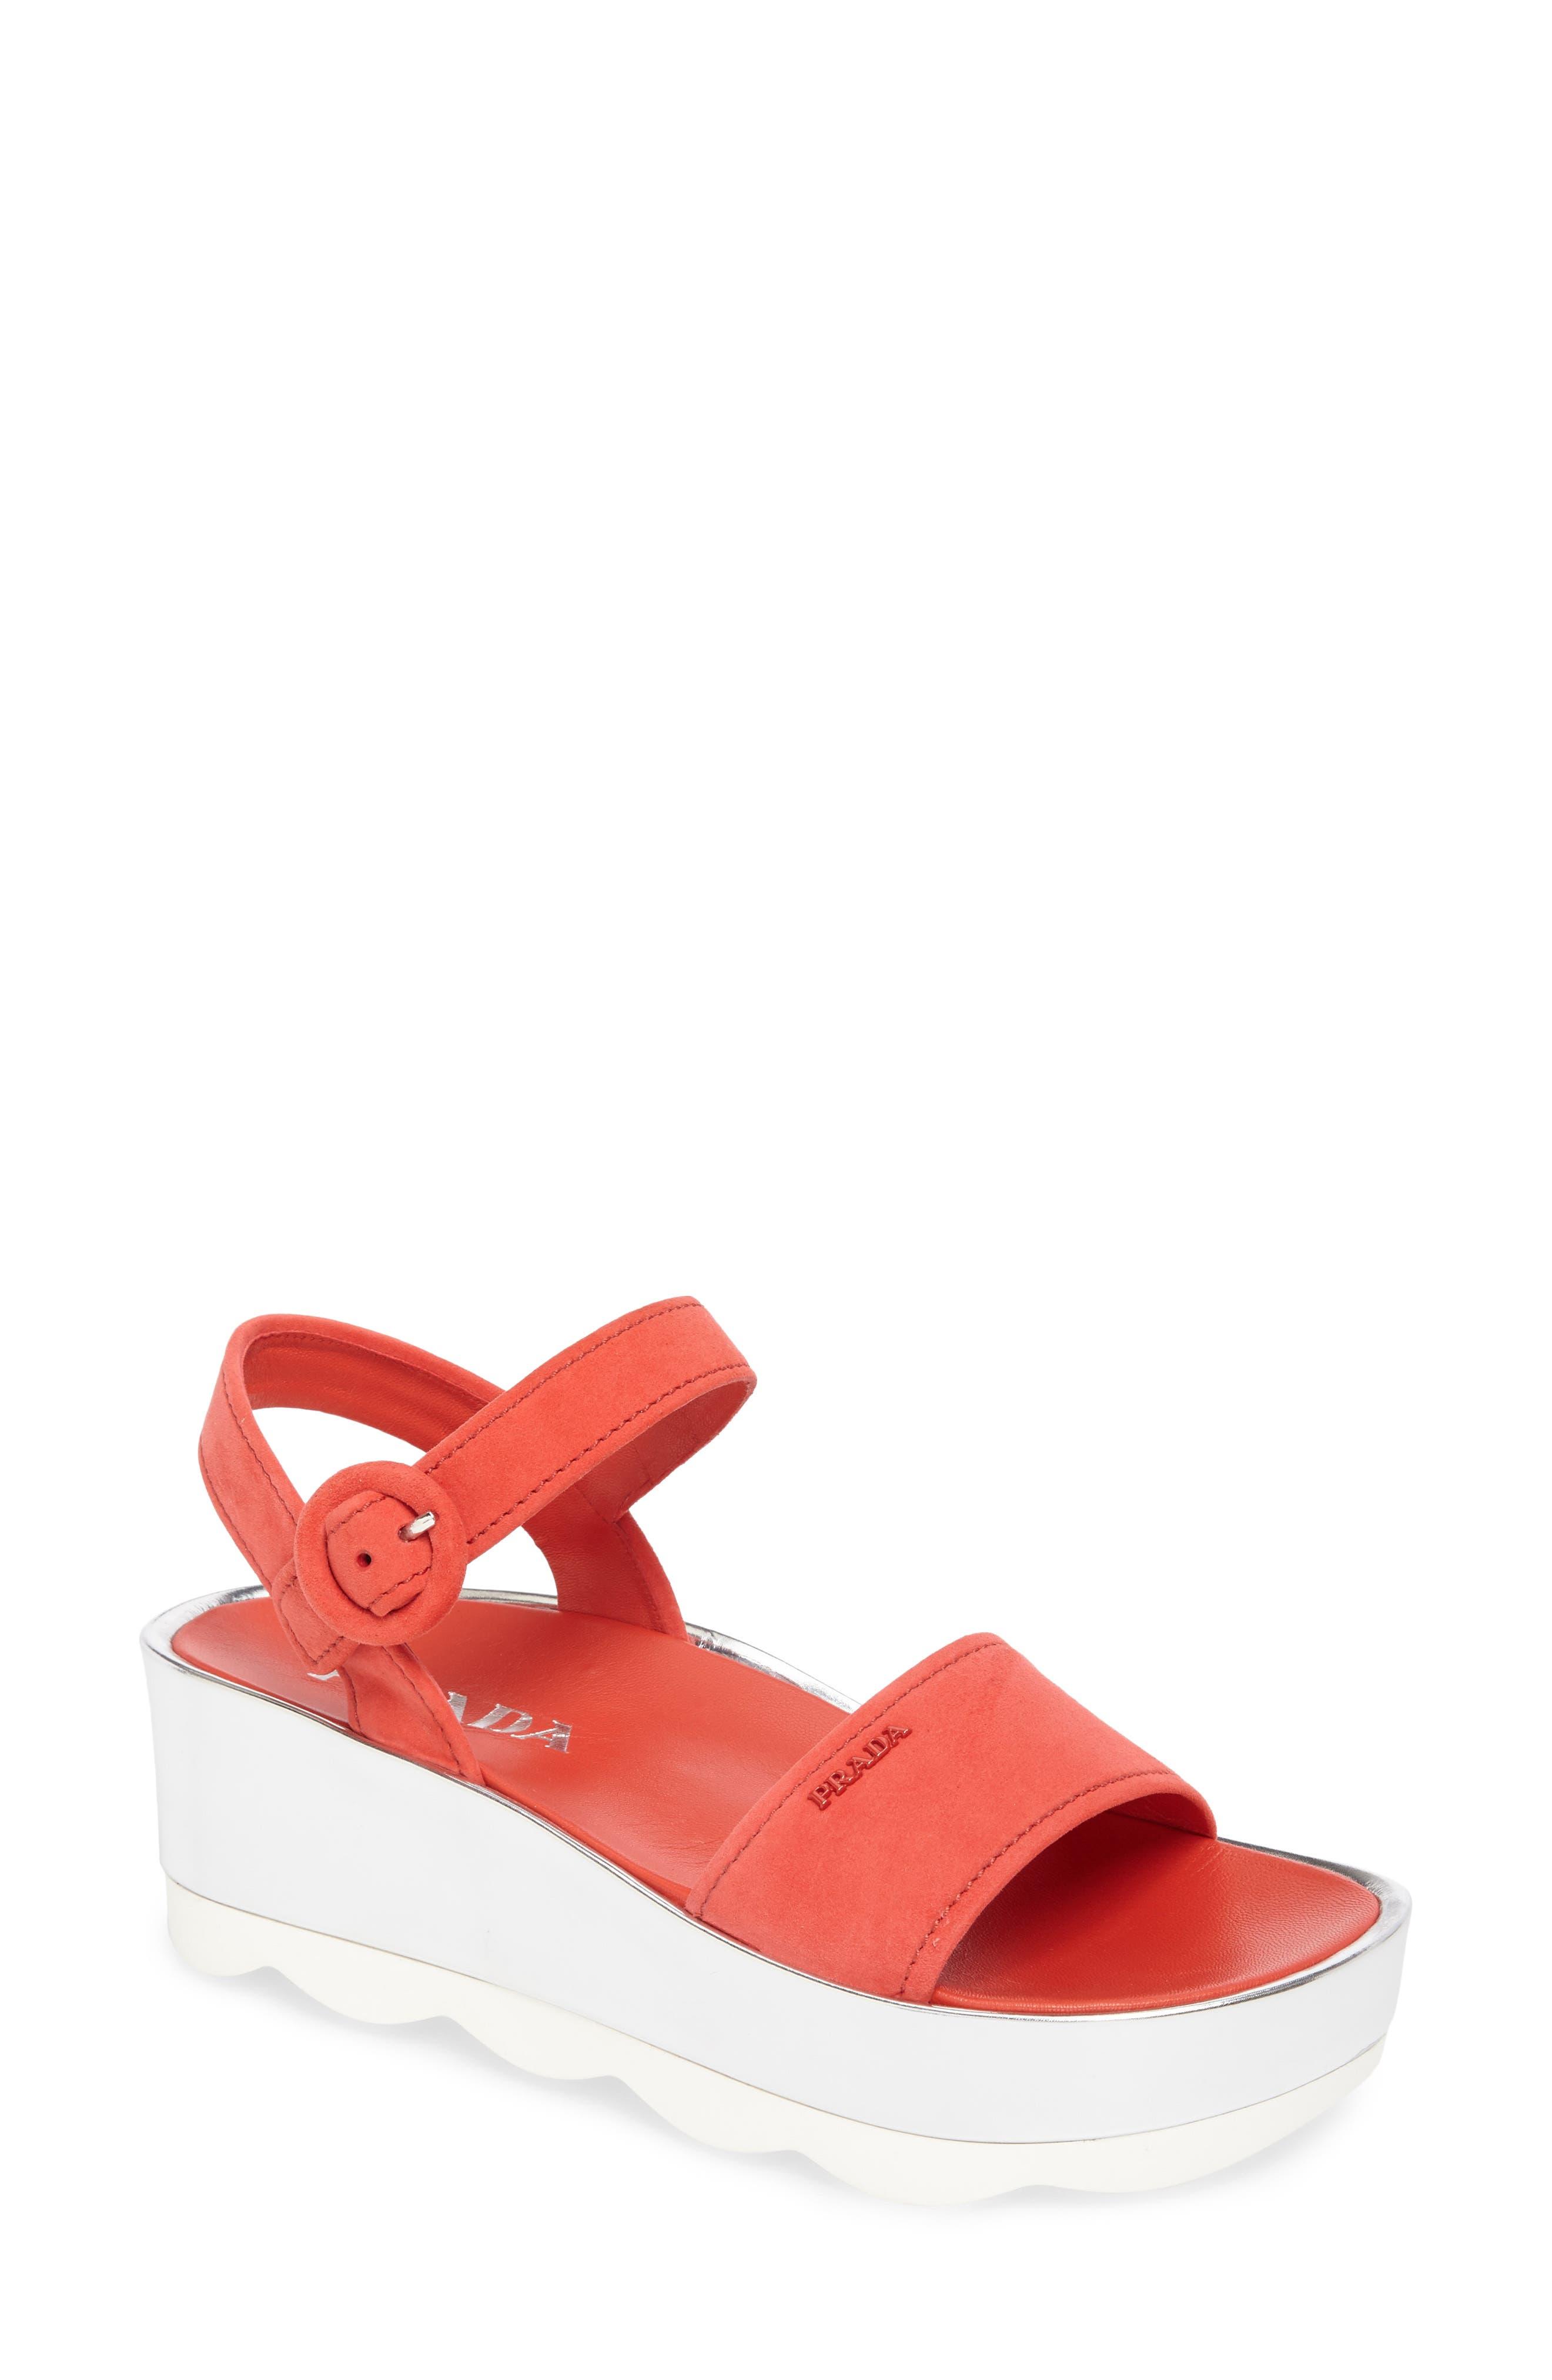 Main Image - Prada Platform Sandal (Women)